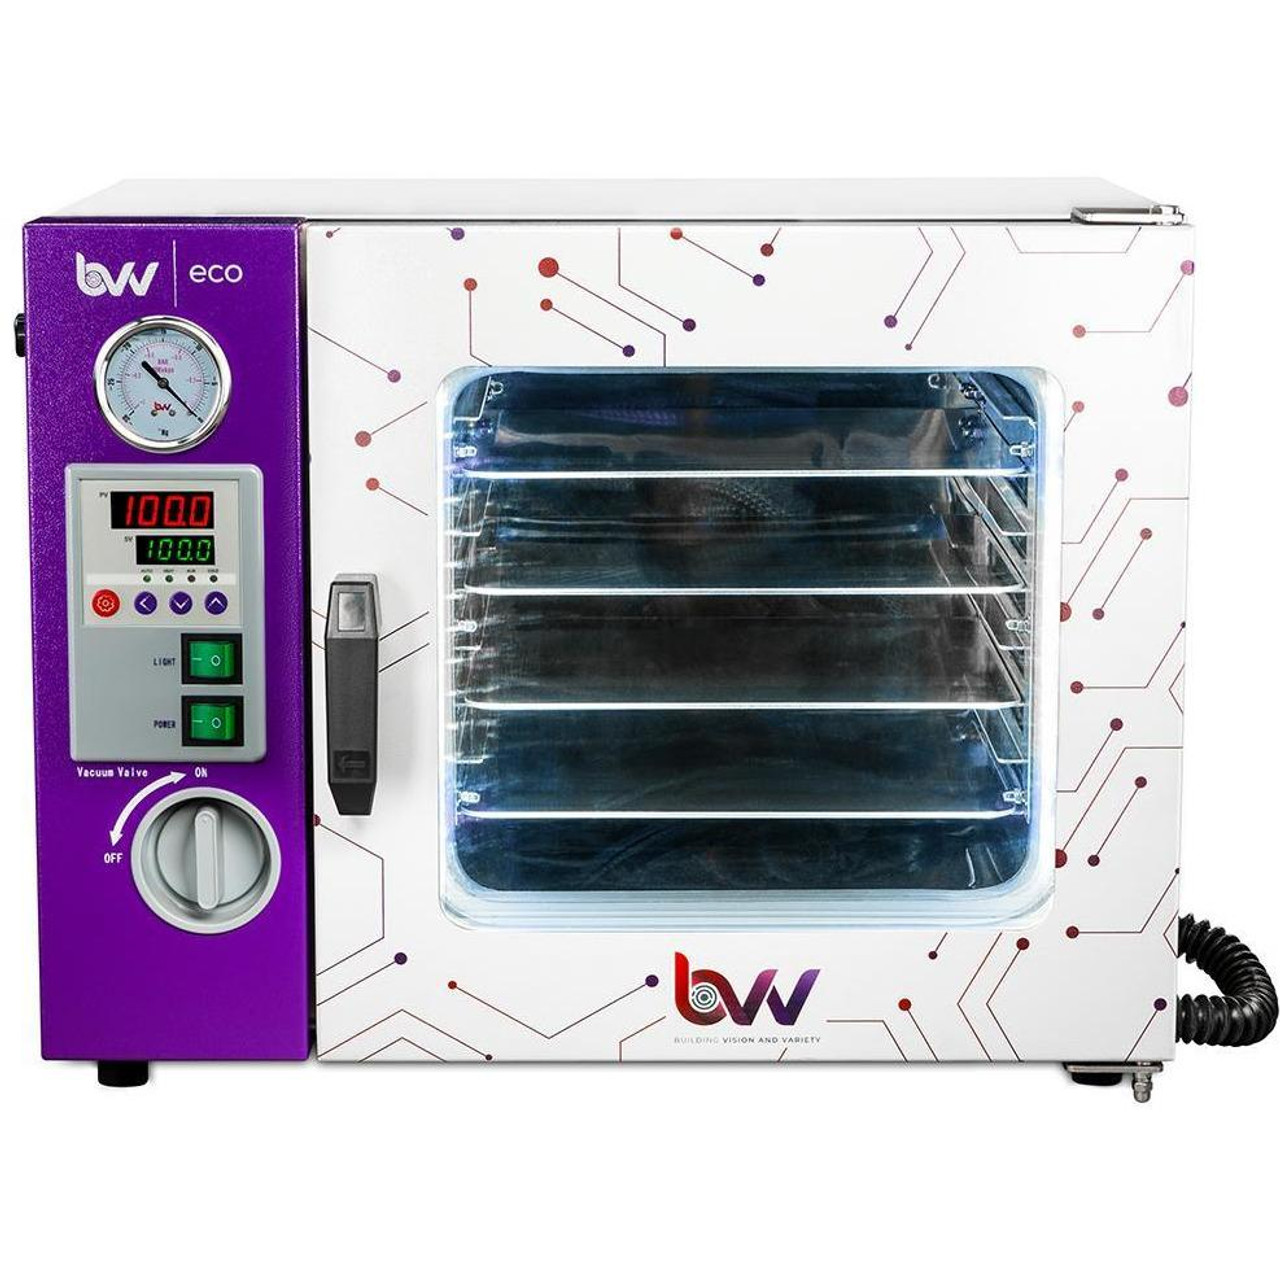 0.9CF ECO Vacuum Oven - 4 Wall Heating, LED display, LED's - 4 Shelves Standard